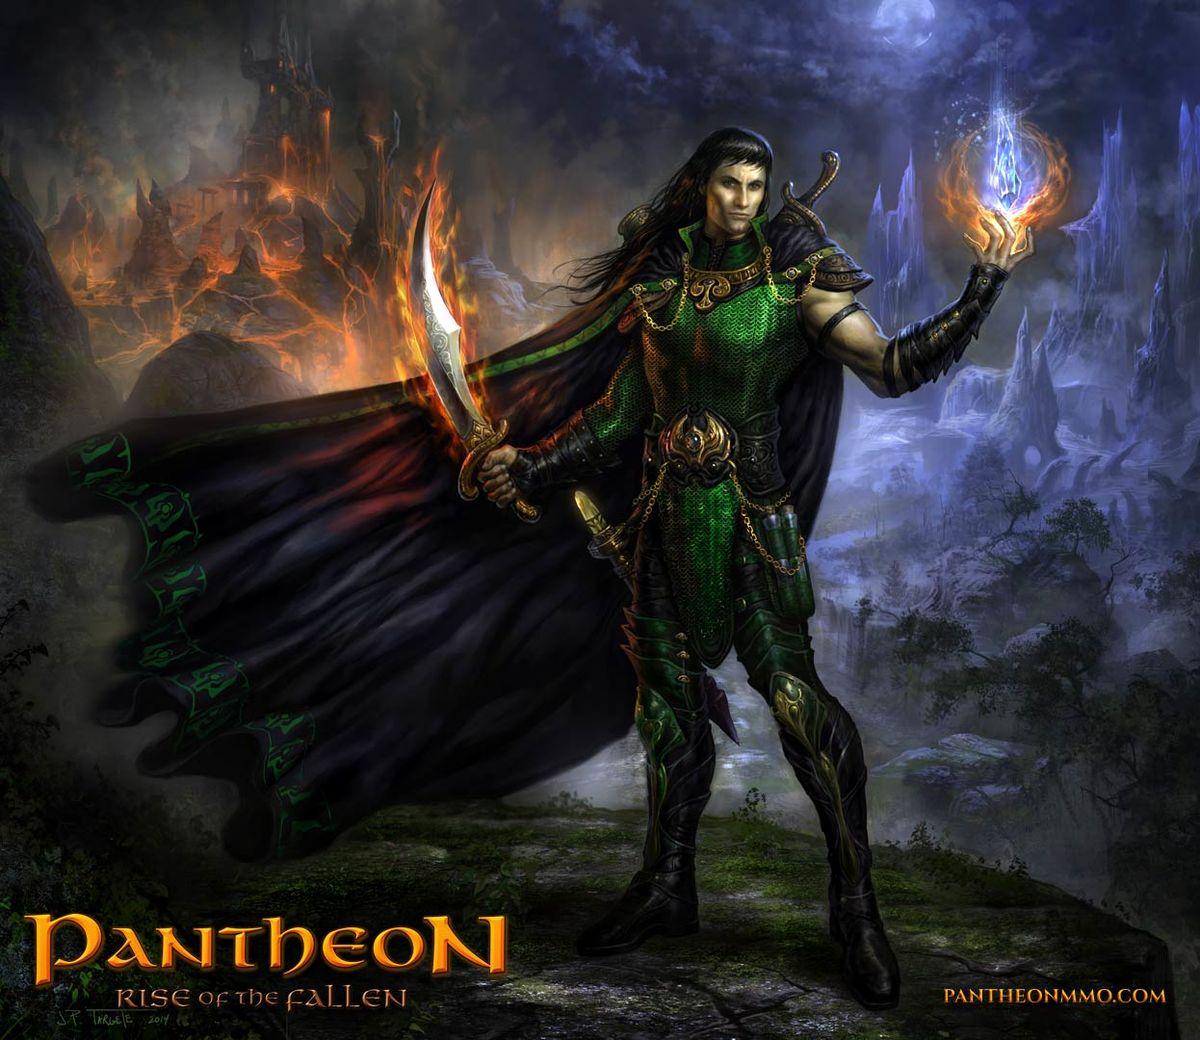 WarWizard - Official Pantheon: Rise of the Fallen Wiki